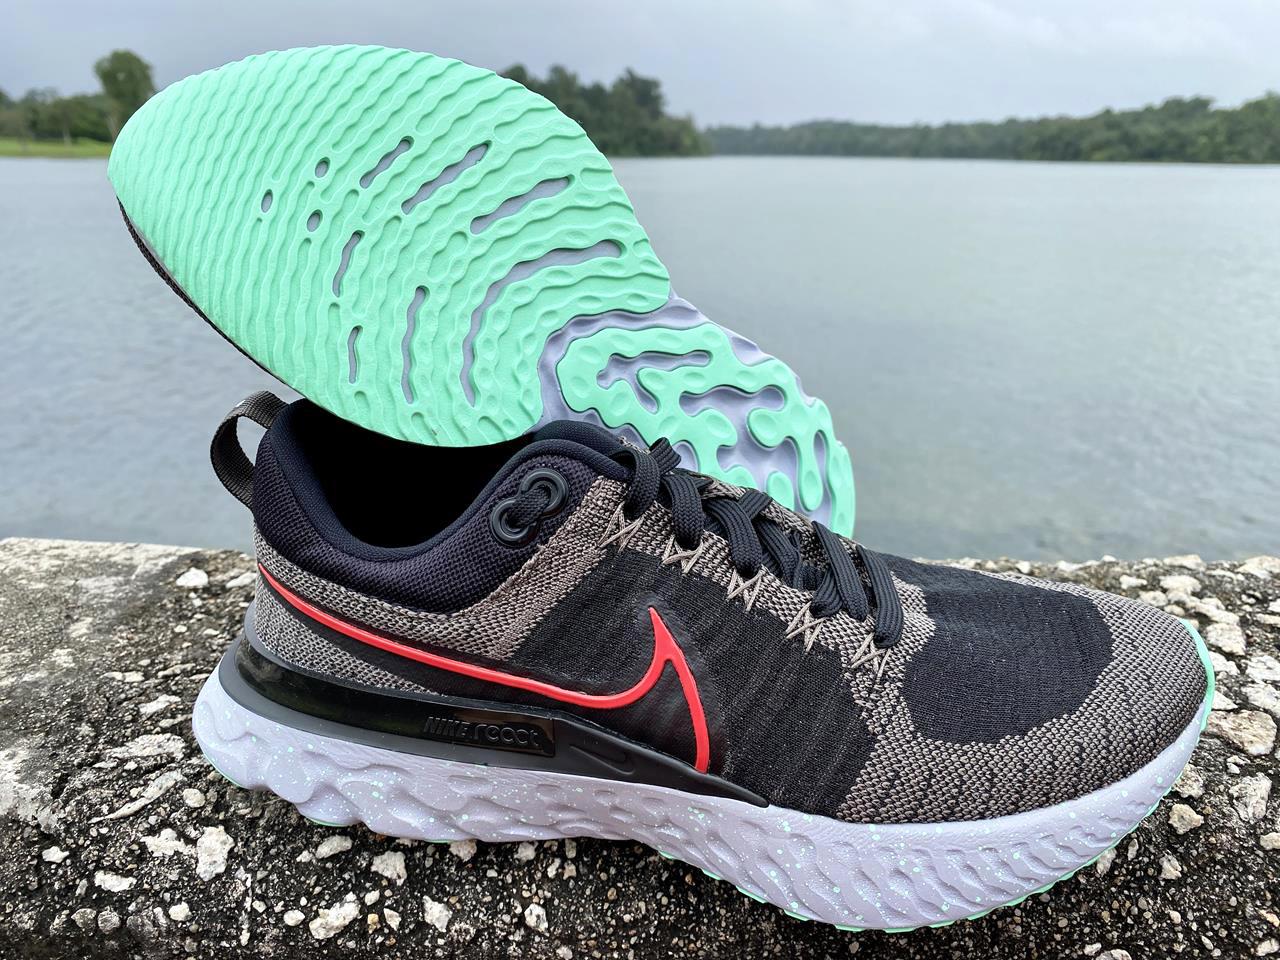 Nike React Infinity Run 2 - Pair